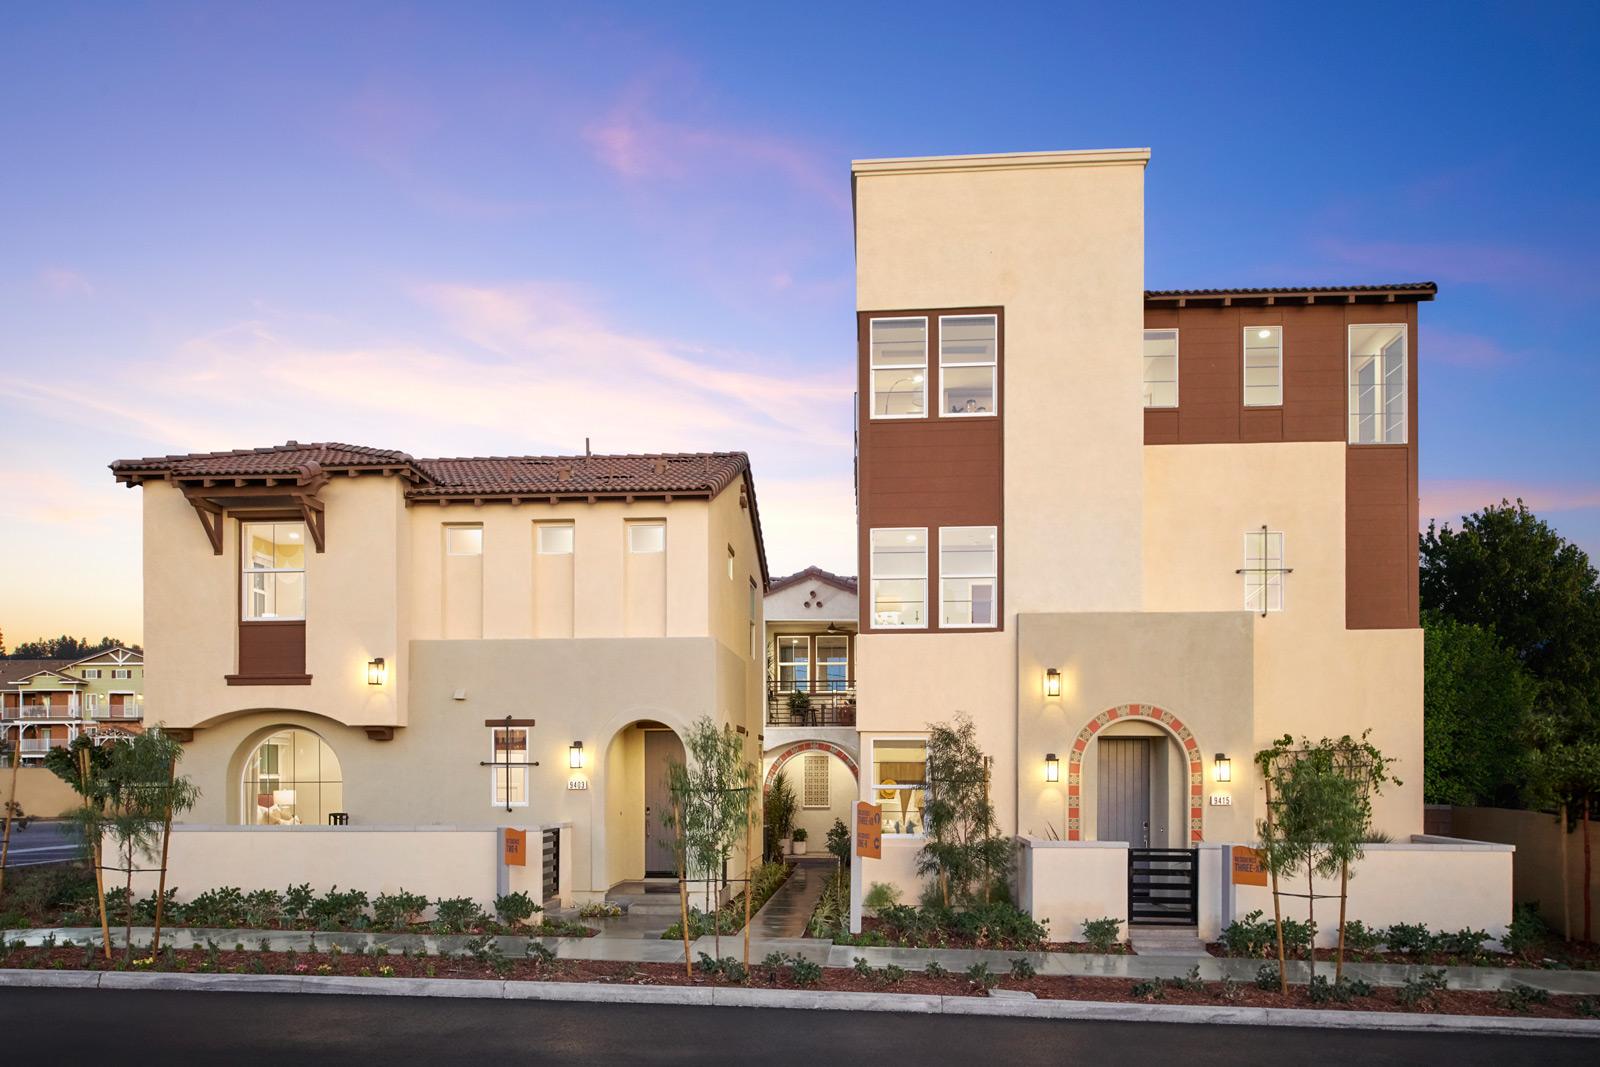 Exterior   Lumin   New Homes in Rancho Cucamonga, CA   Van Daele Homes